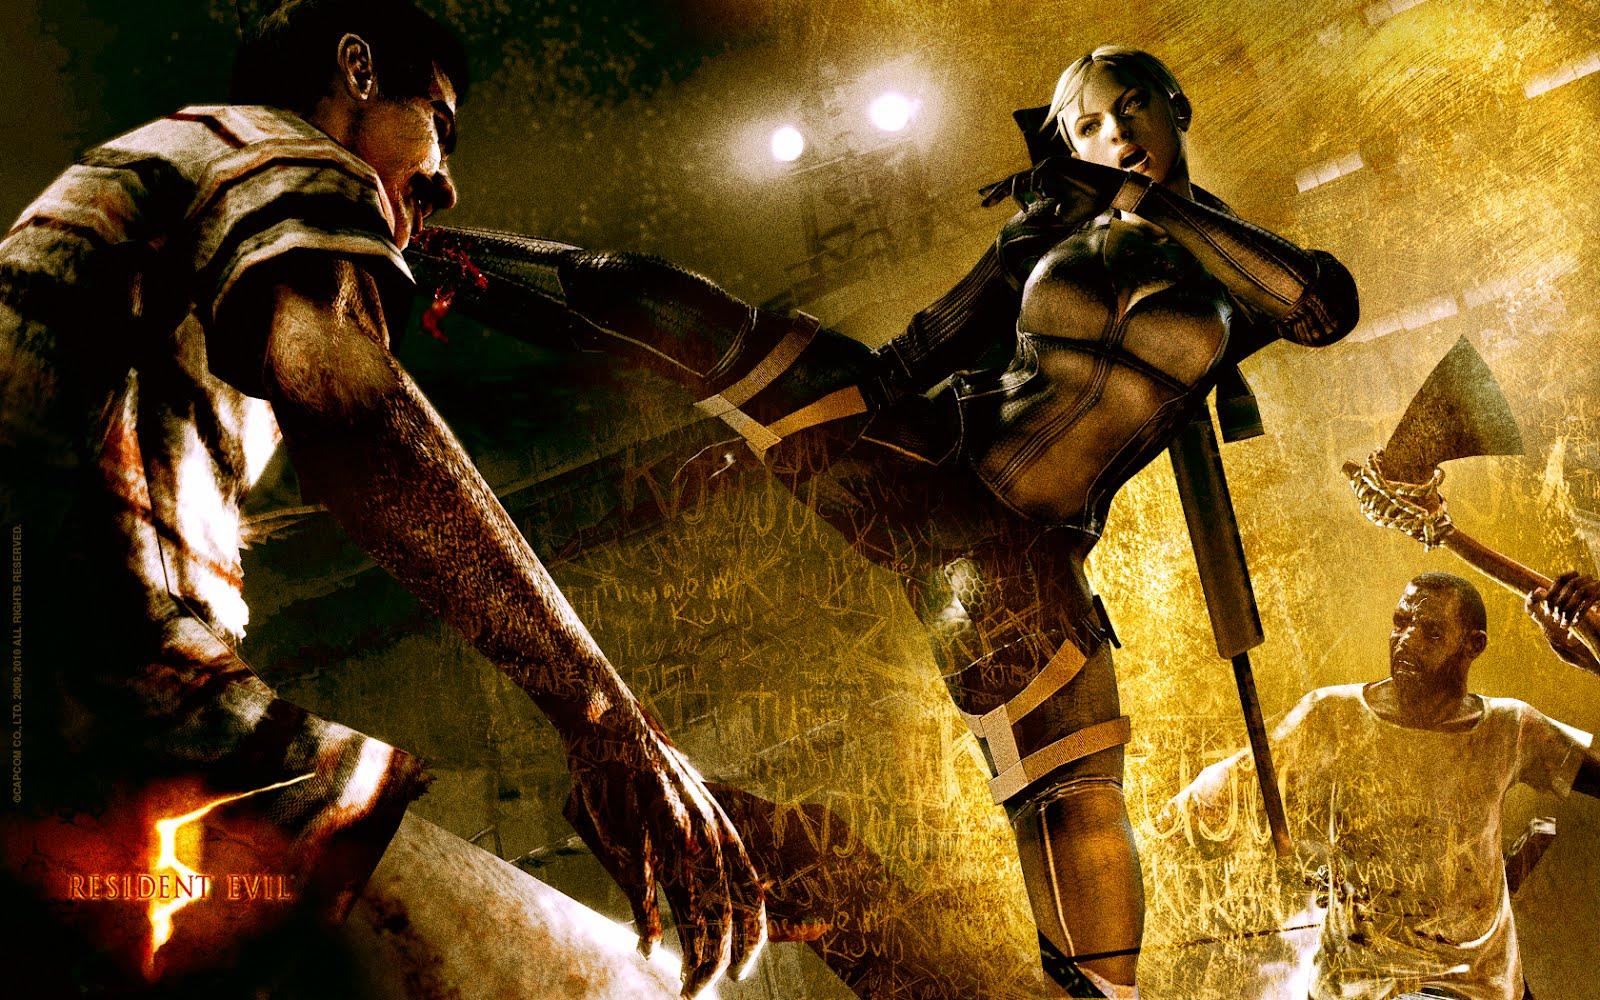 http://1.bp.blogspot.com/-MNy0J8B_oHQ/T7smphAxUWI/AAAAAAAAAus/IZ7dzqoHOXg/s1600/Resident_Evil_5_-_Desperate_Escape_wallpaper_-_Jill_Valentine.jpg